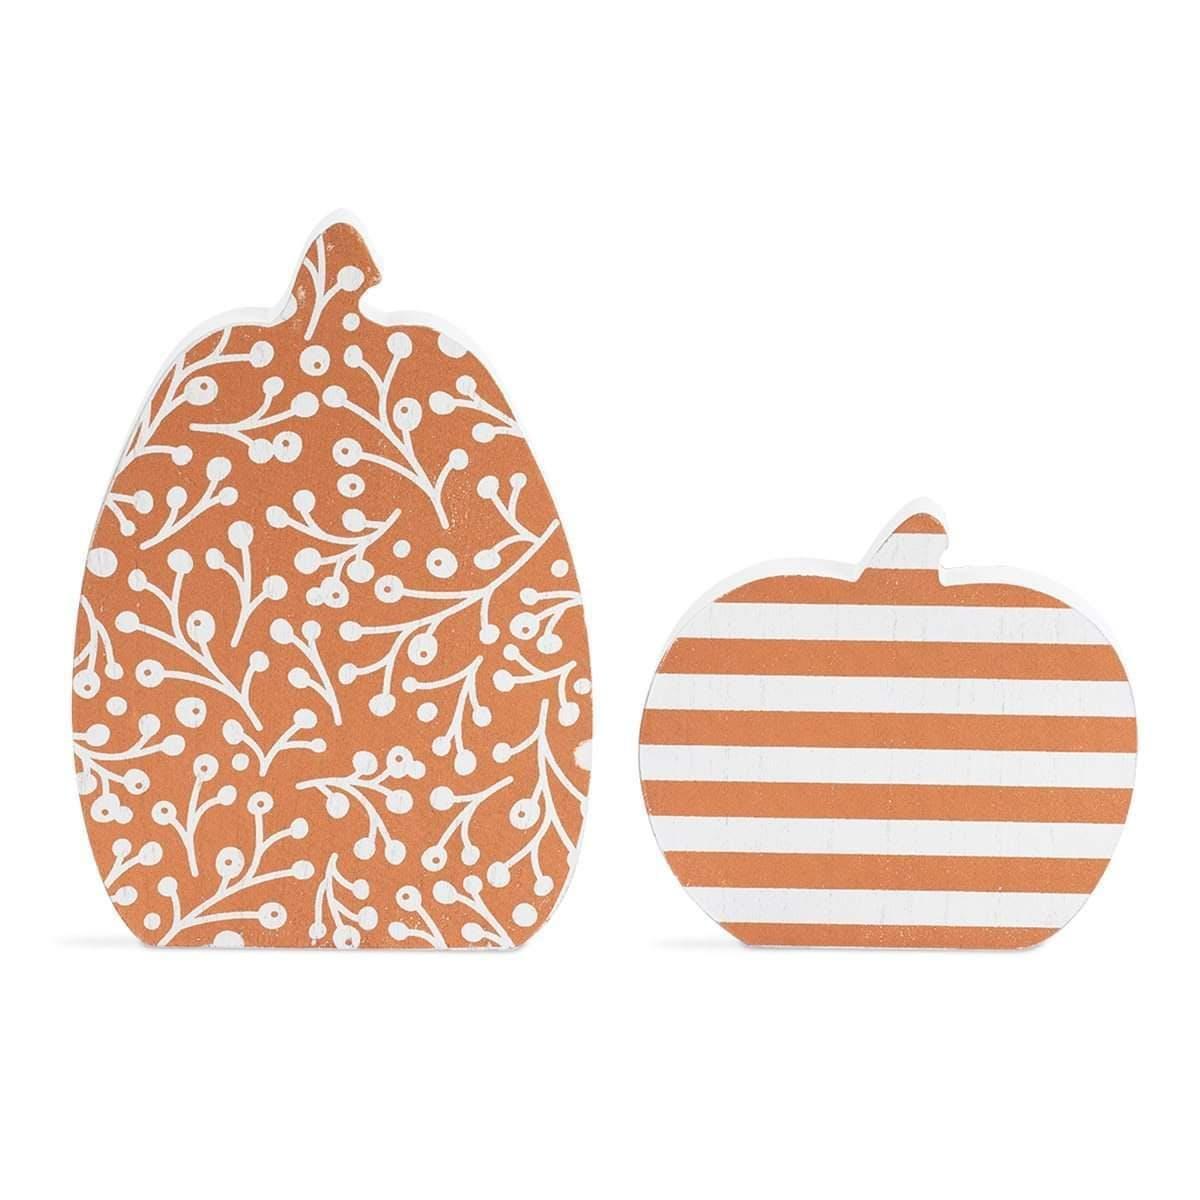 Pumpkin decor create and take